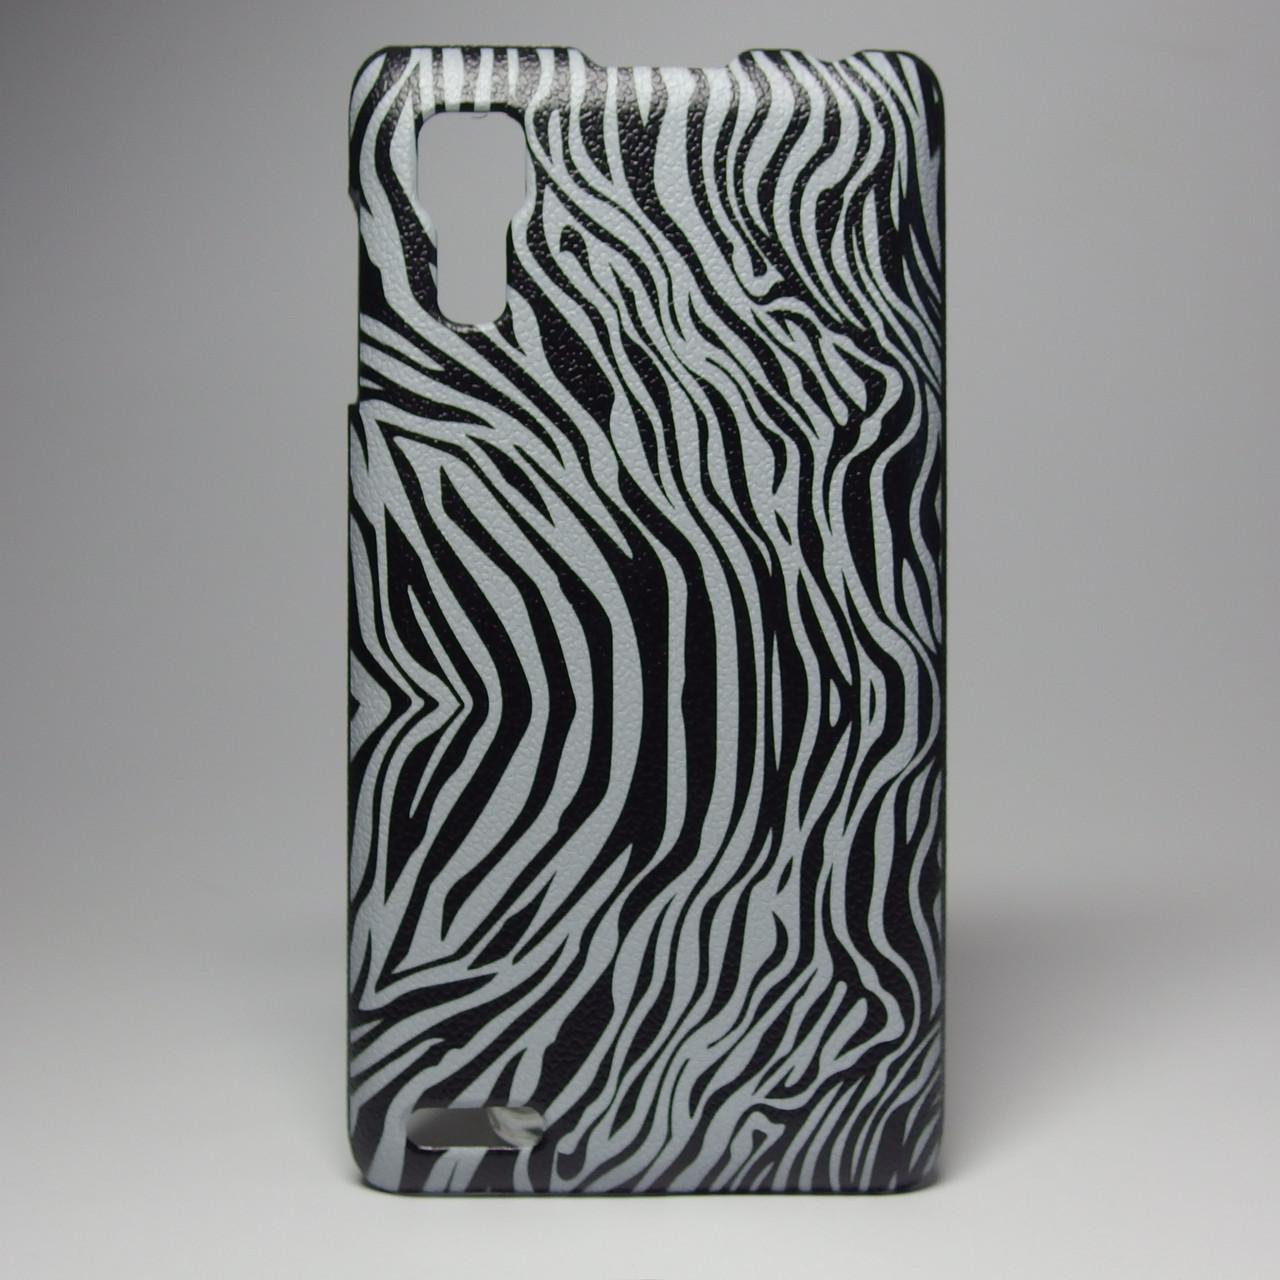 Чехол для lenovo p780 панель накладка с рисунком зебра